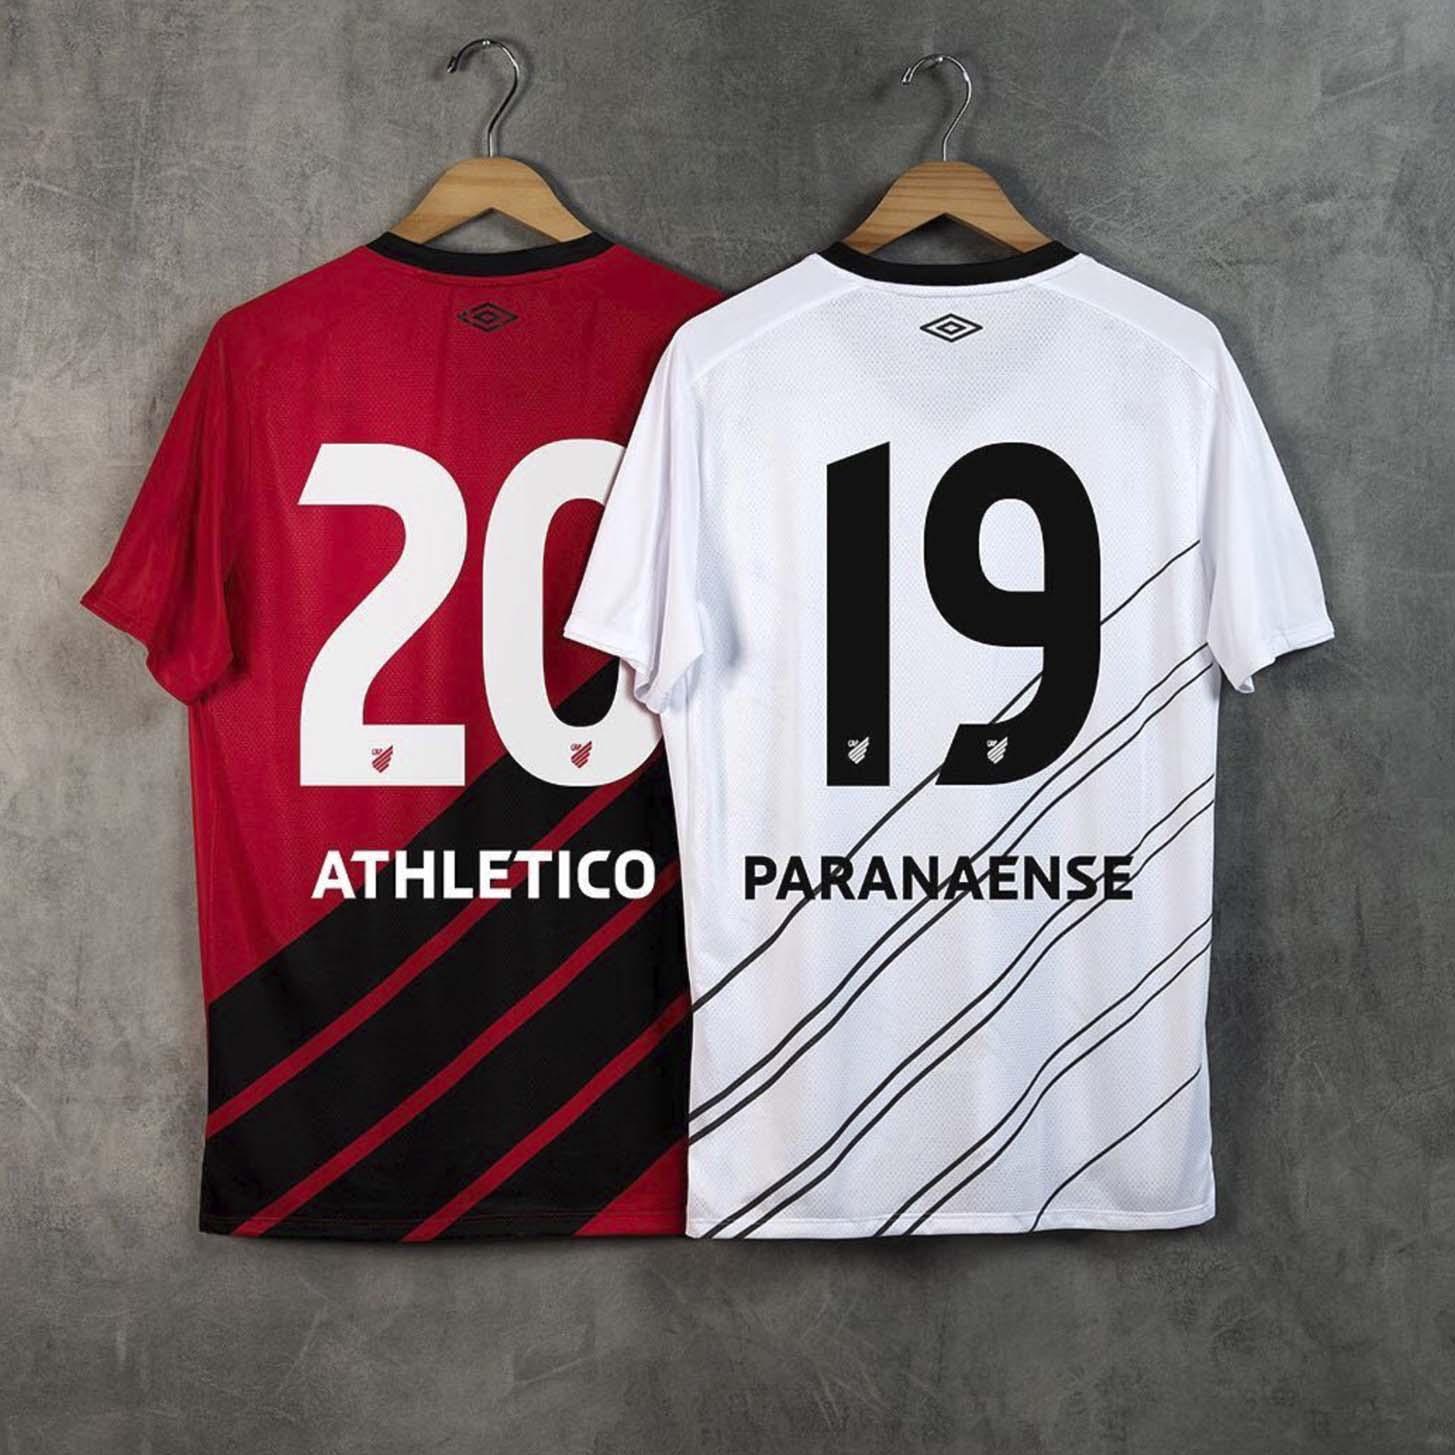 dfac2a837f9 5-umbro-paranaese-18-19.jpg. Pick up both Athletico Paranaense 2019 Umbro  Home   Away Shirts ...